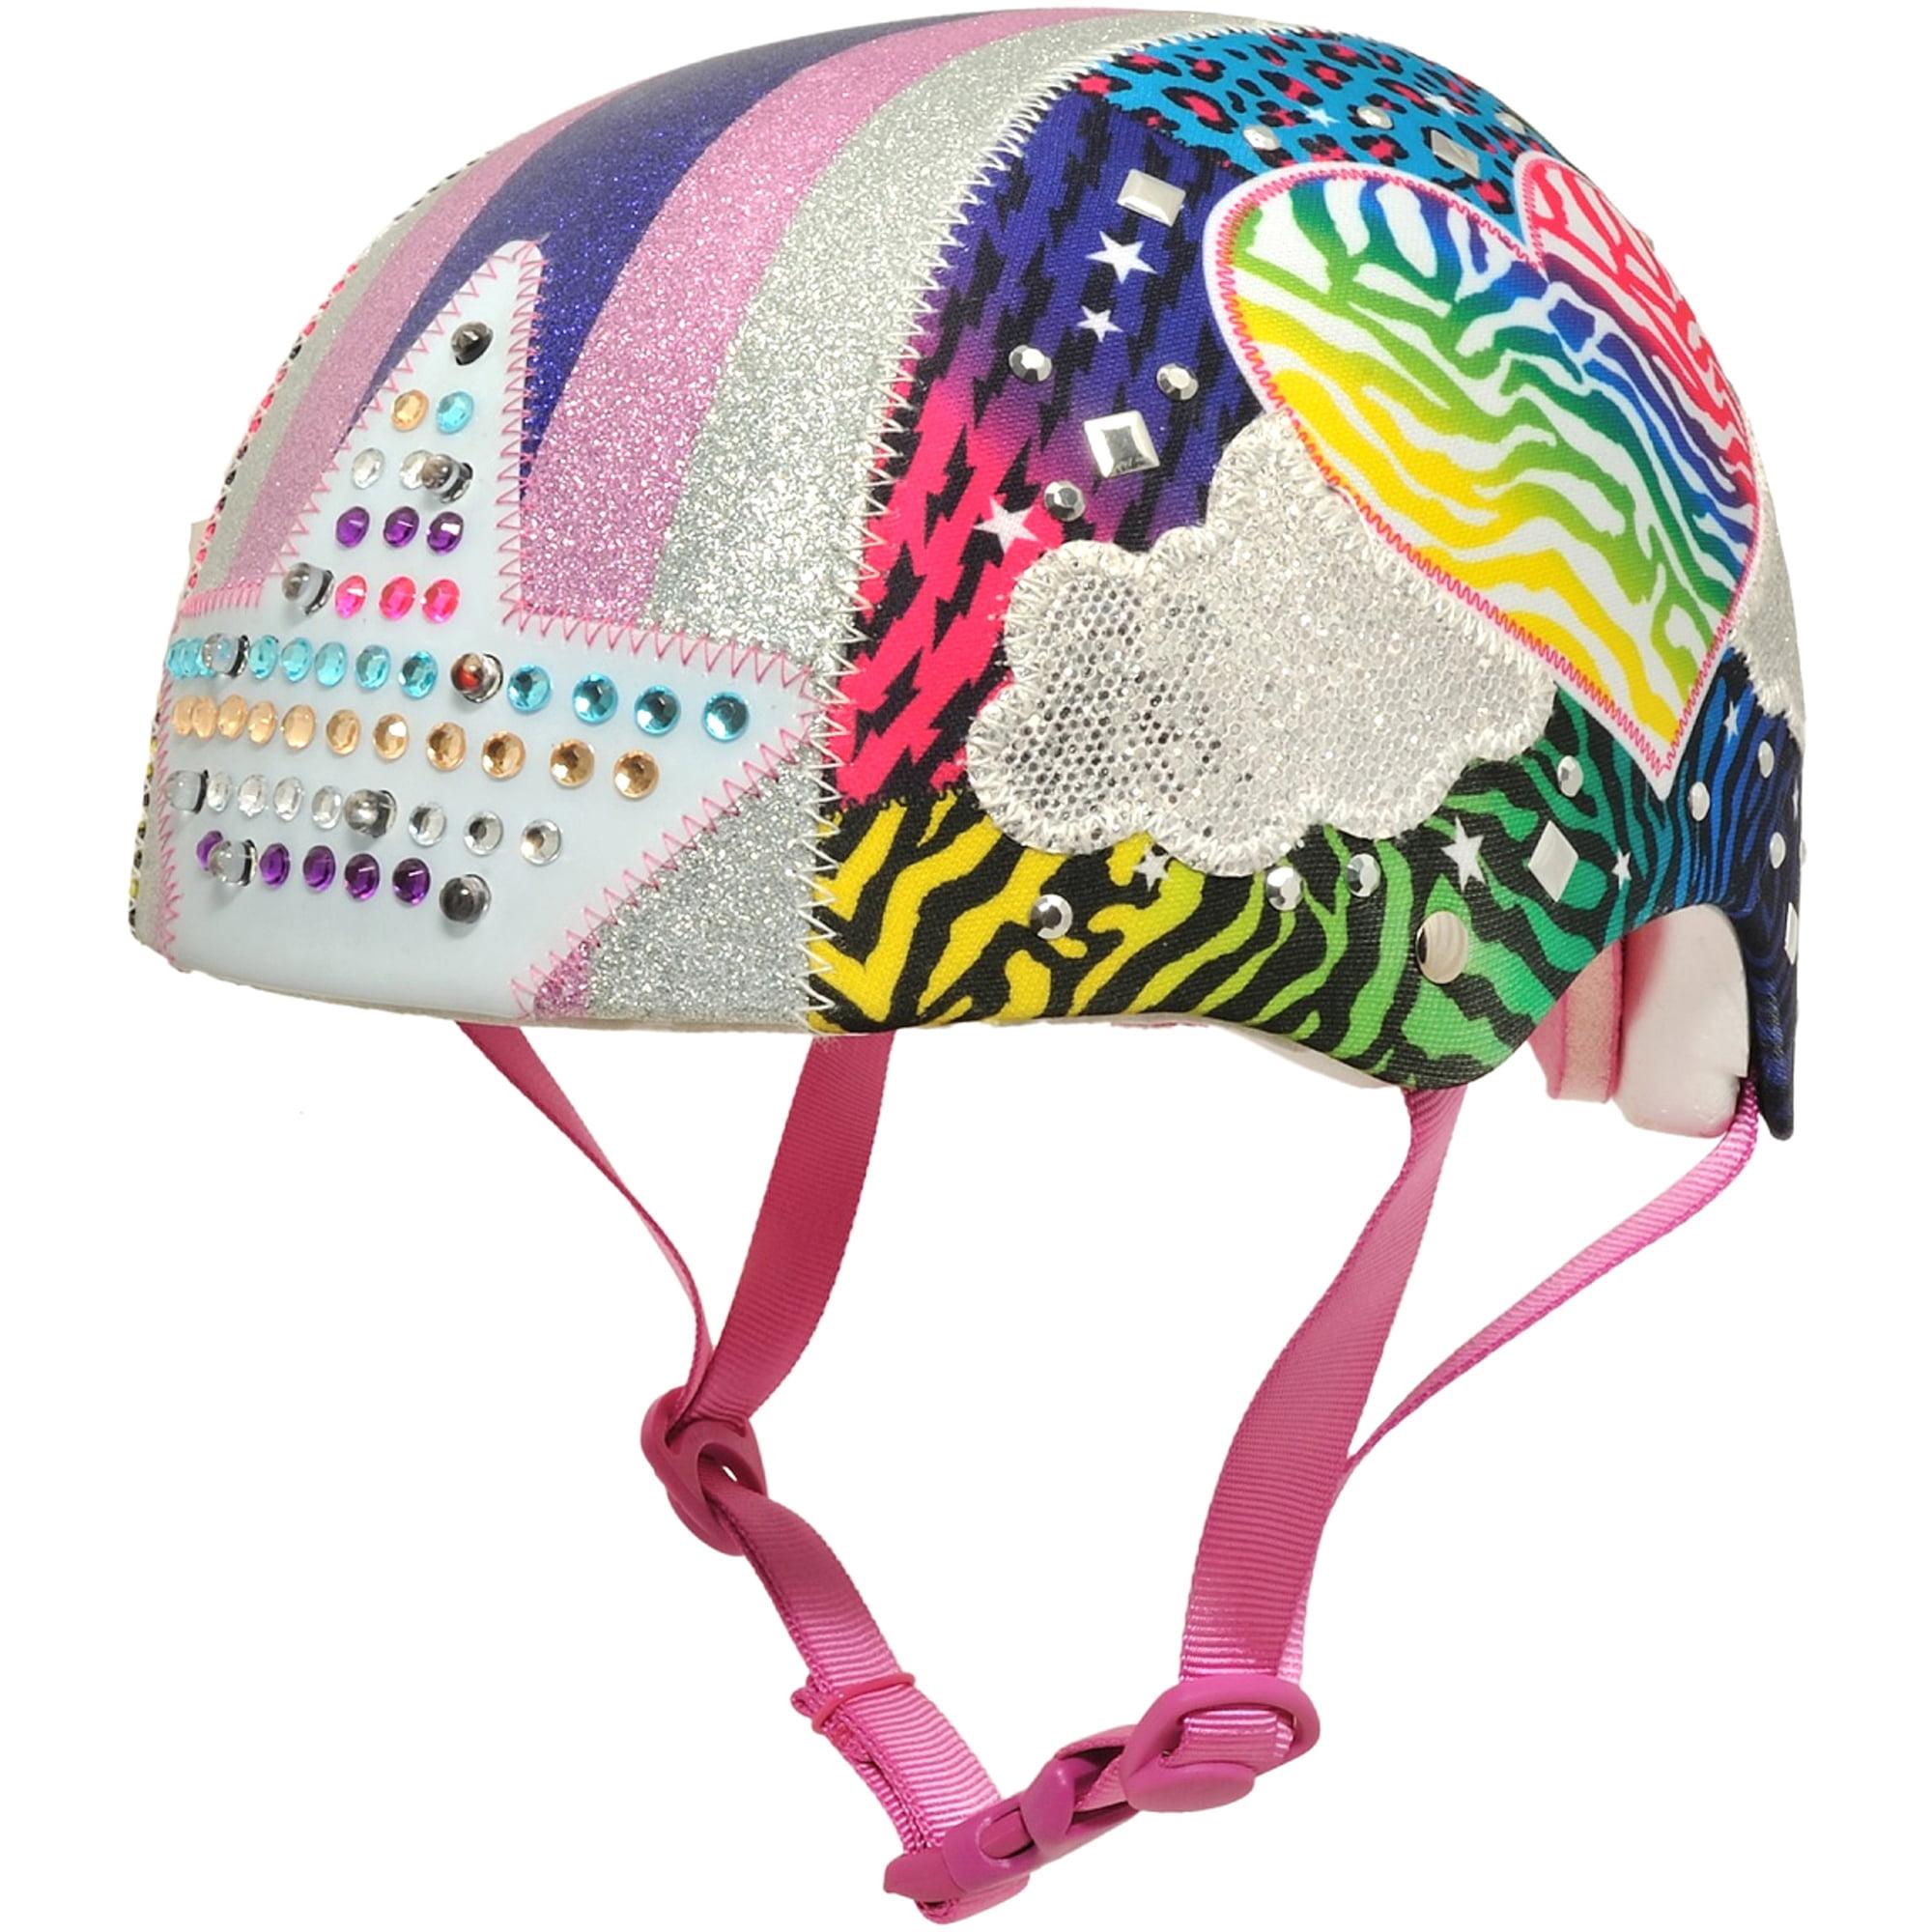 Raskullz Sparklez Jungle Love with LED Lights Child Bike Skate Helmet by Cpreme